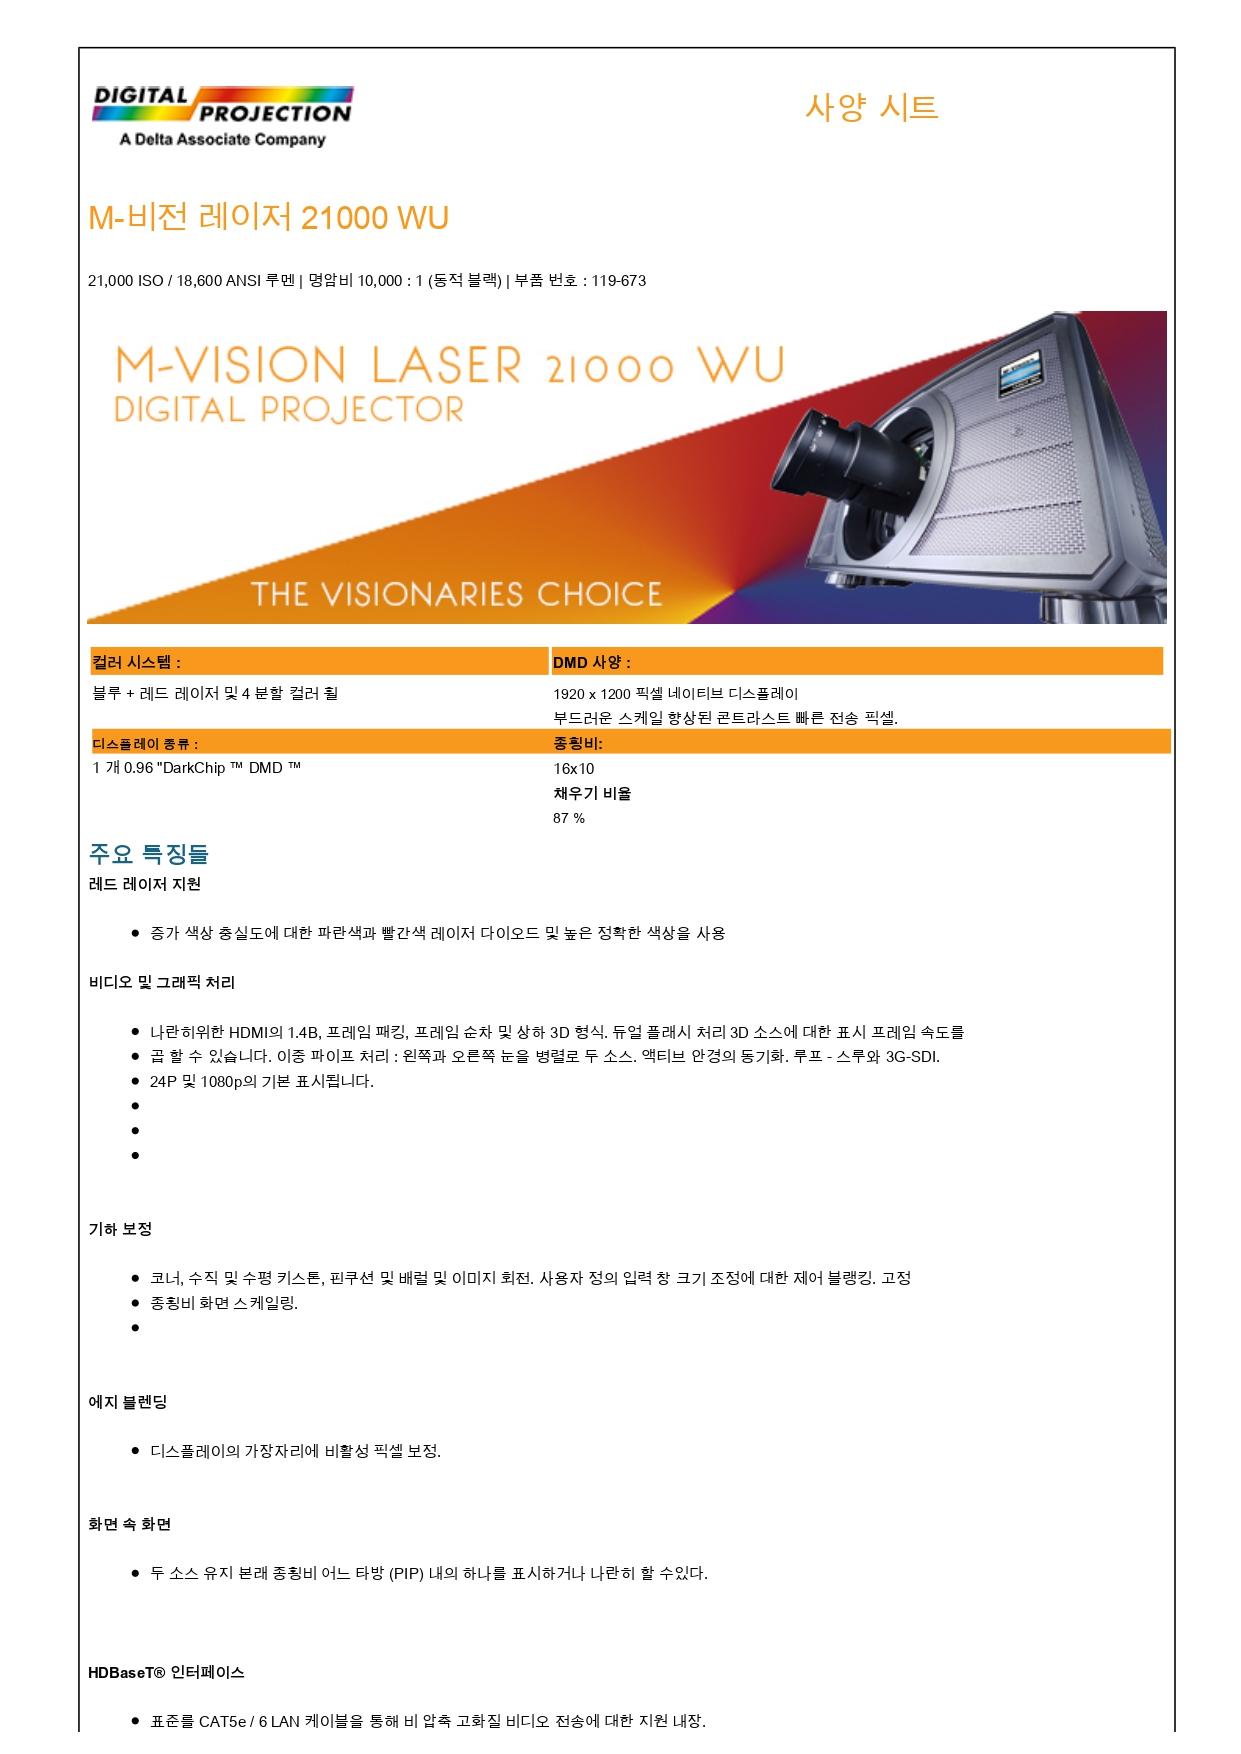 digitalprojection-119-673.en.ko_page-0001.jpg